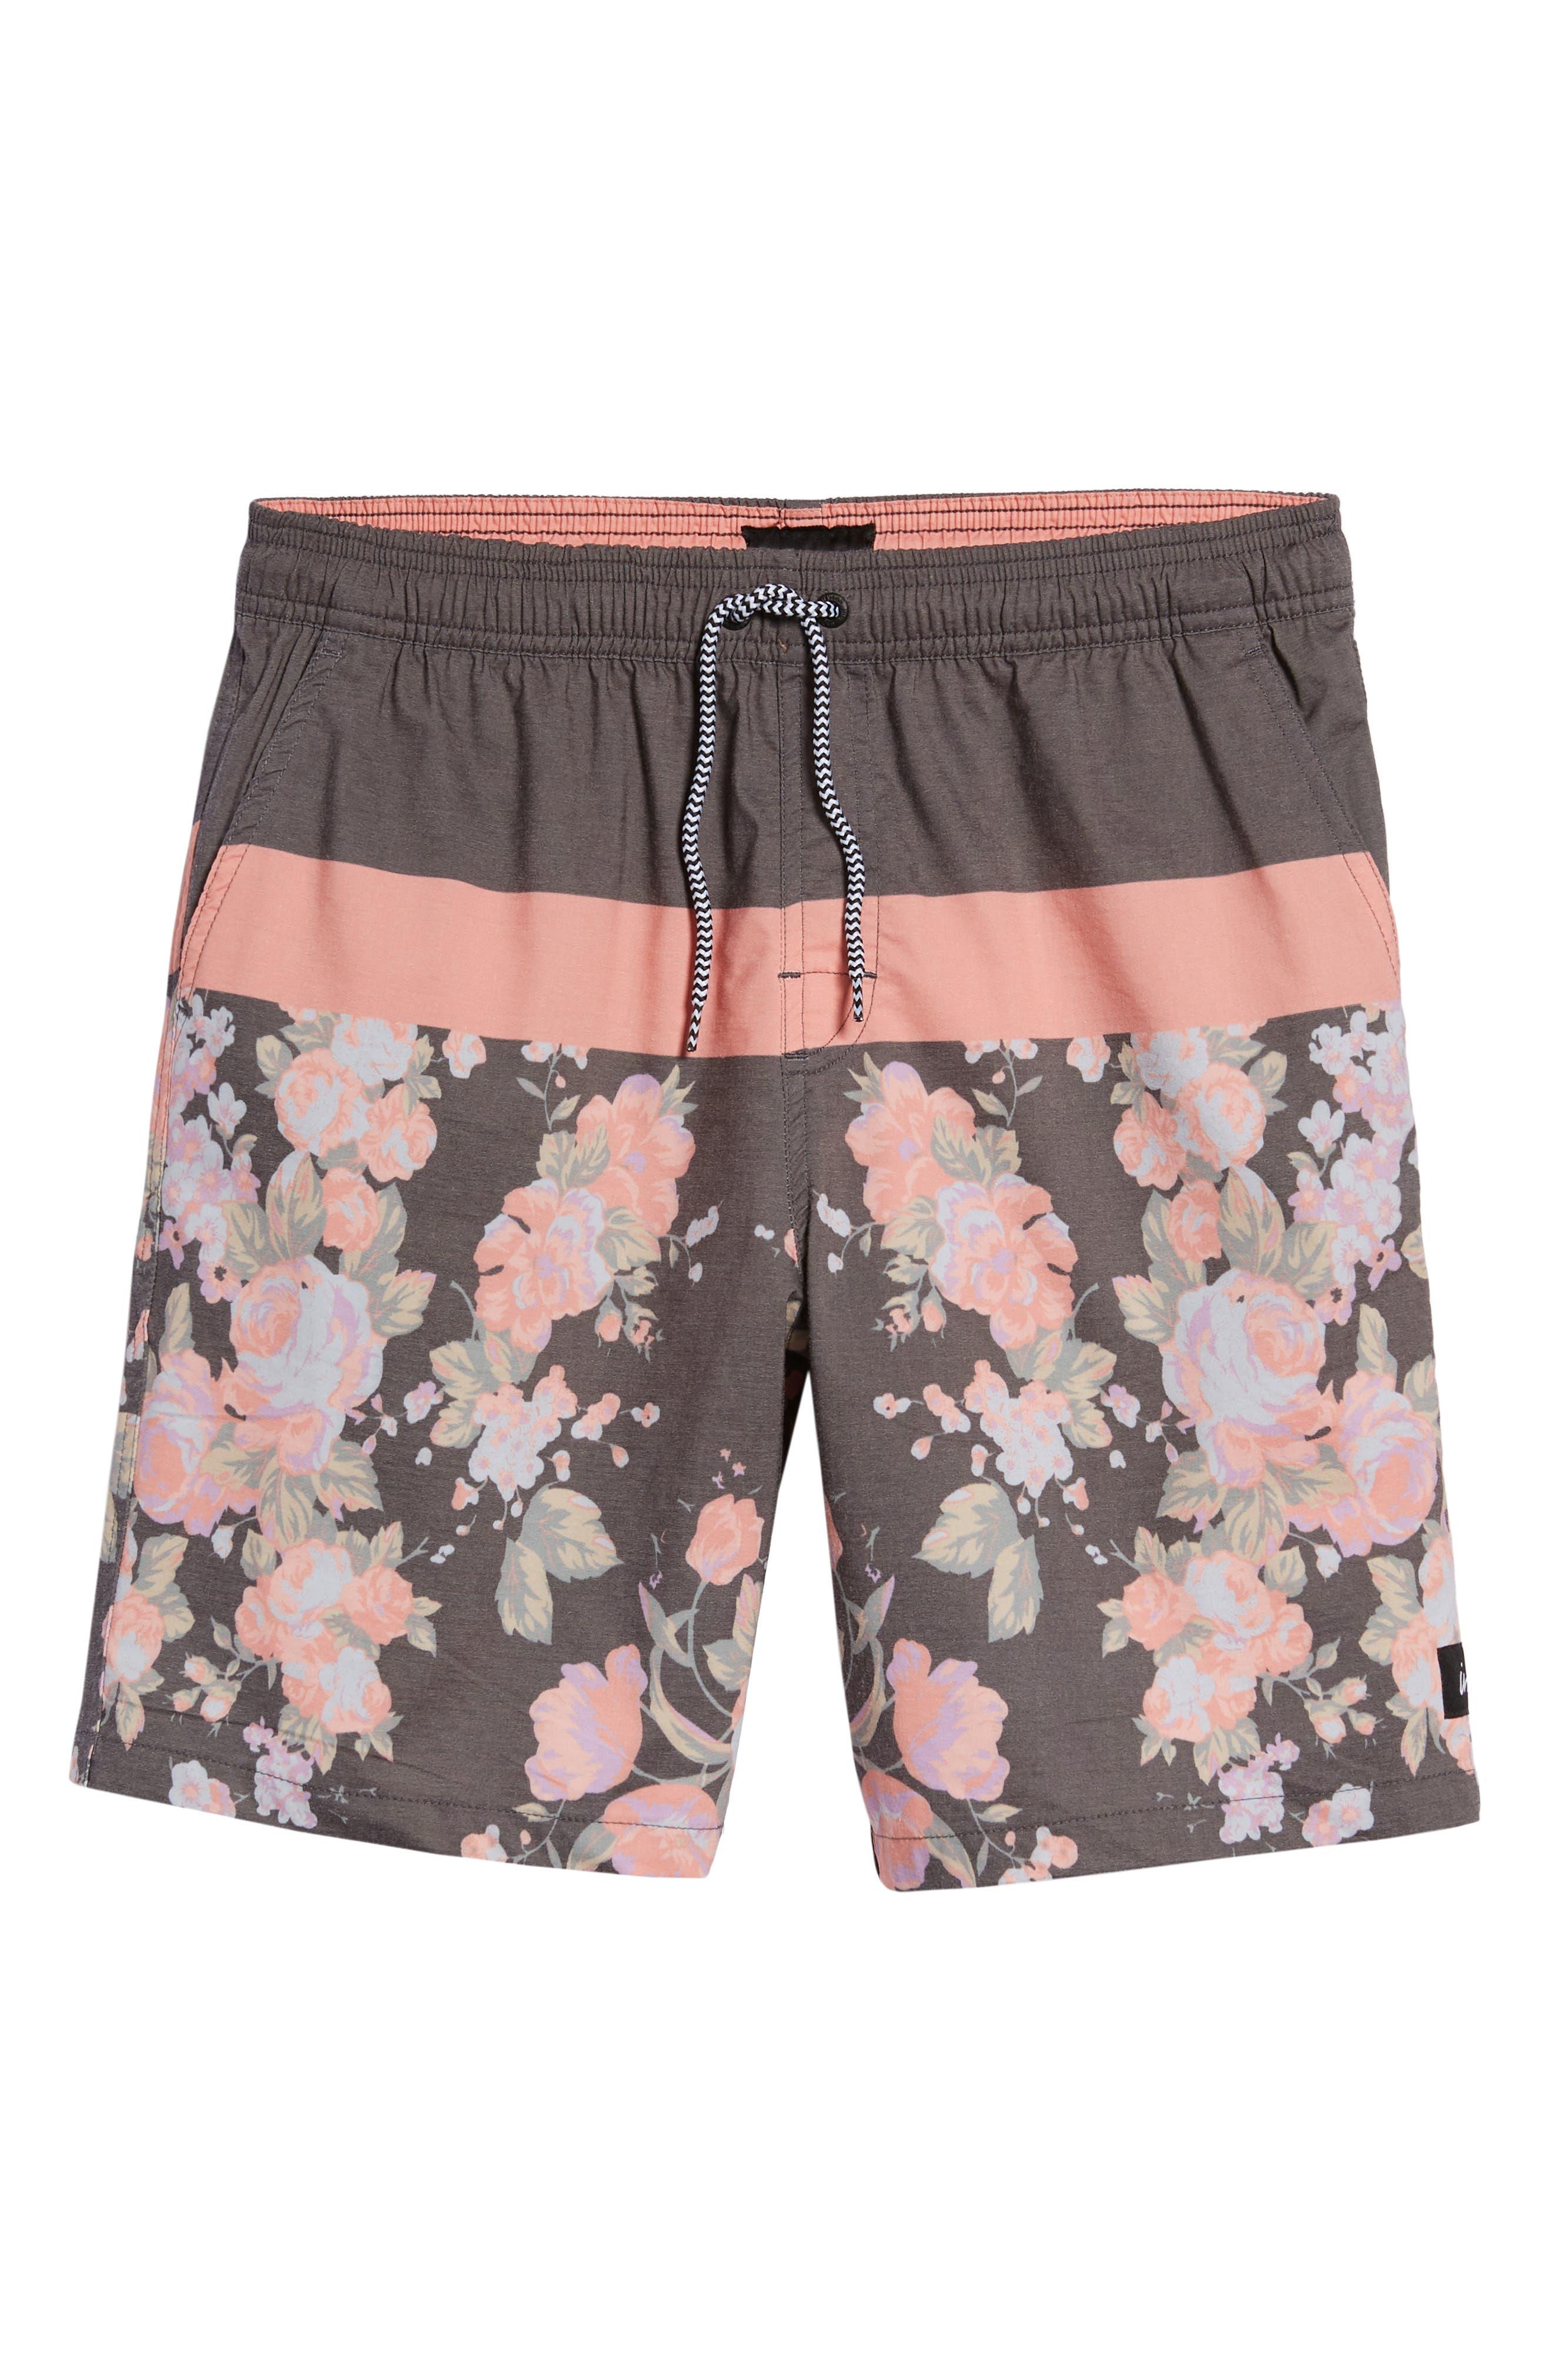 Hayworth Board Shorts,                             Alternate thumbnail 6, color,                             020